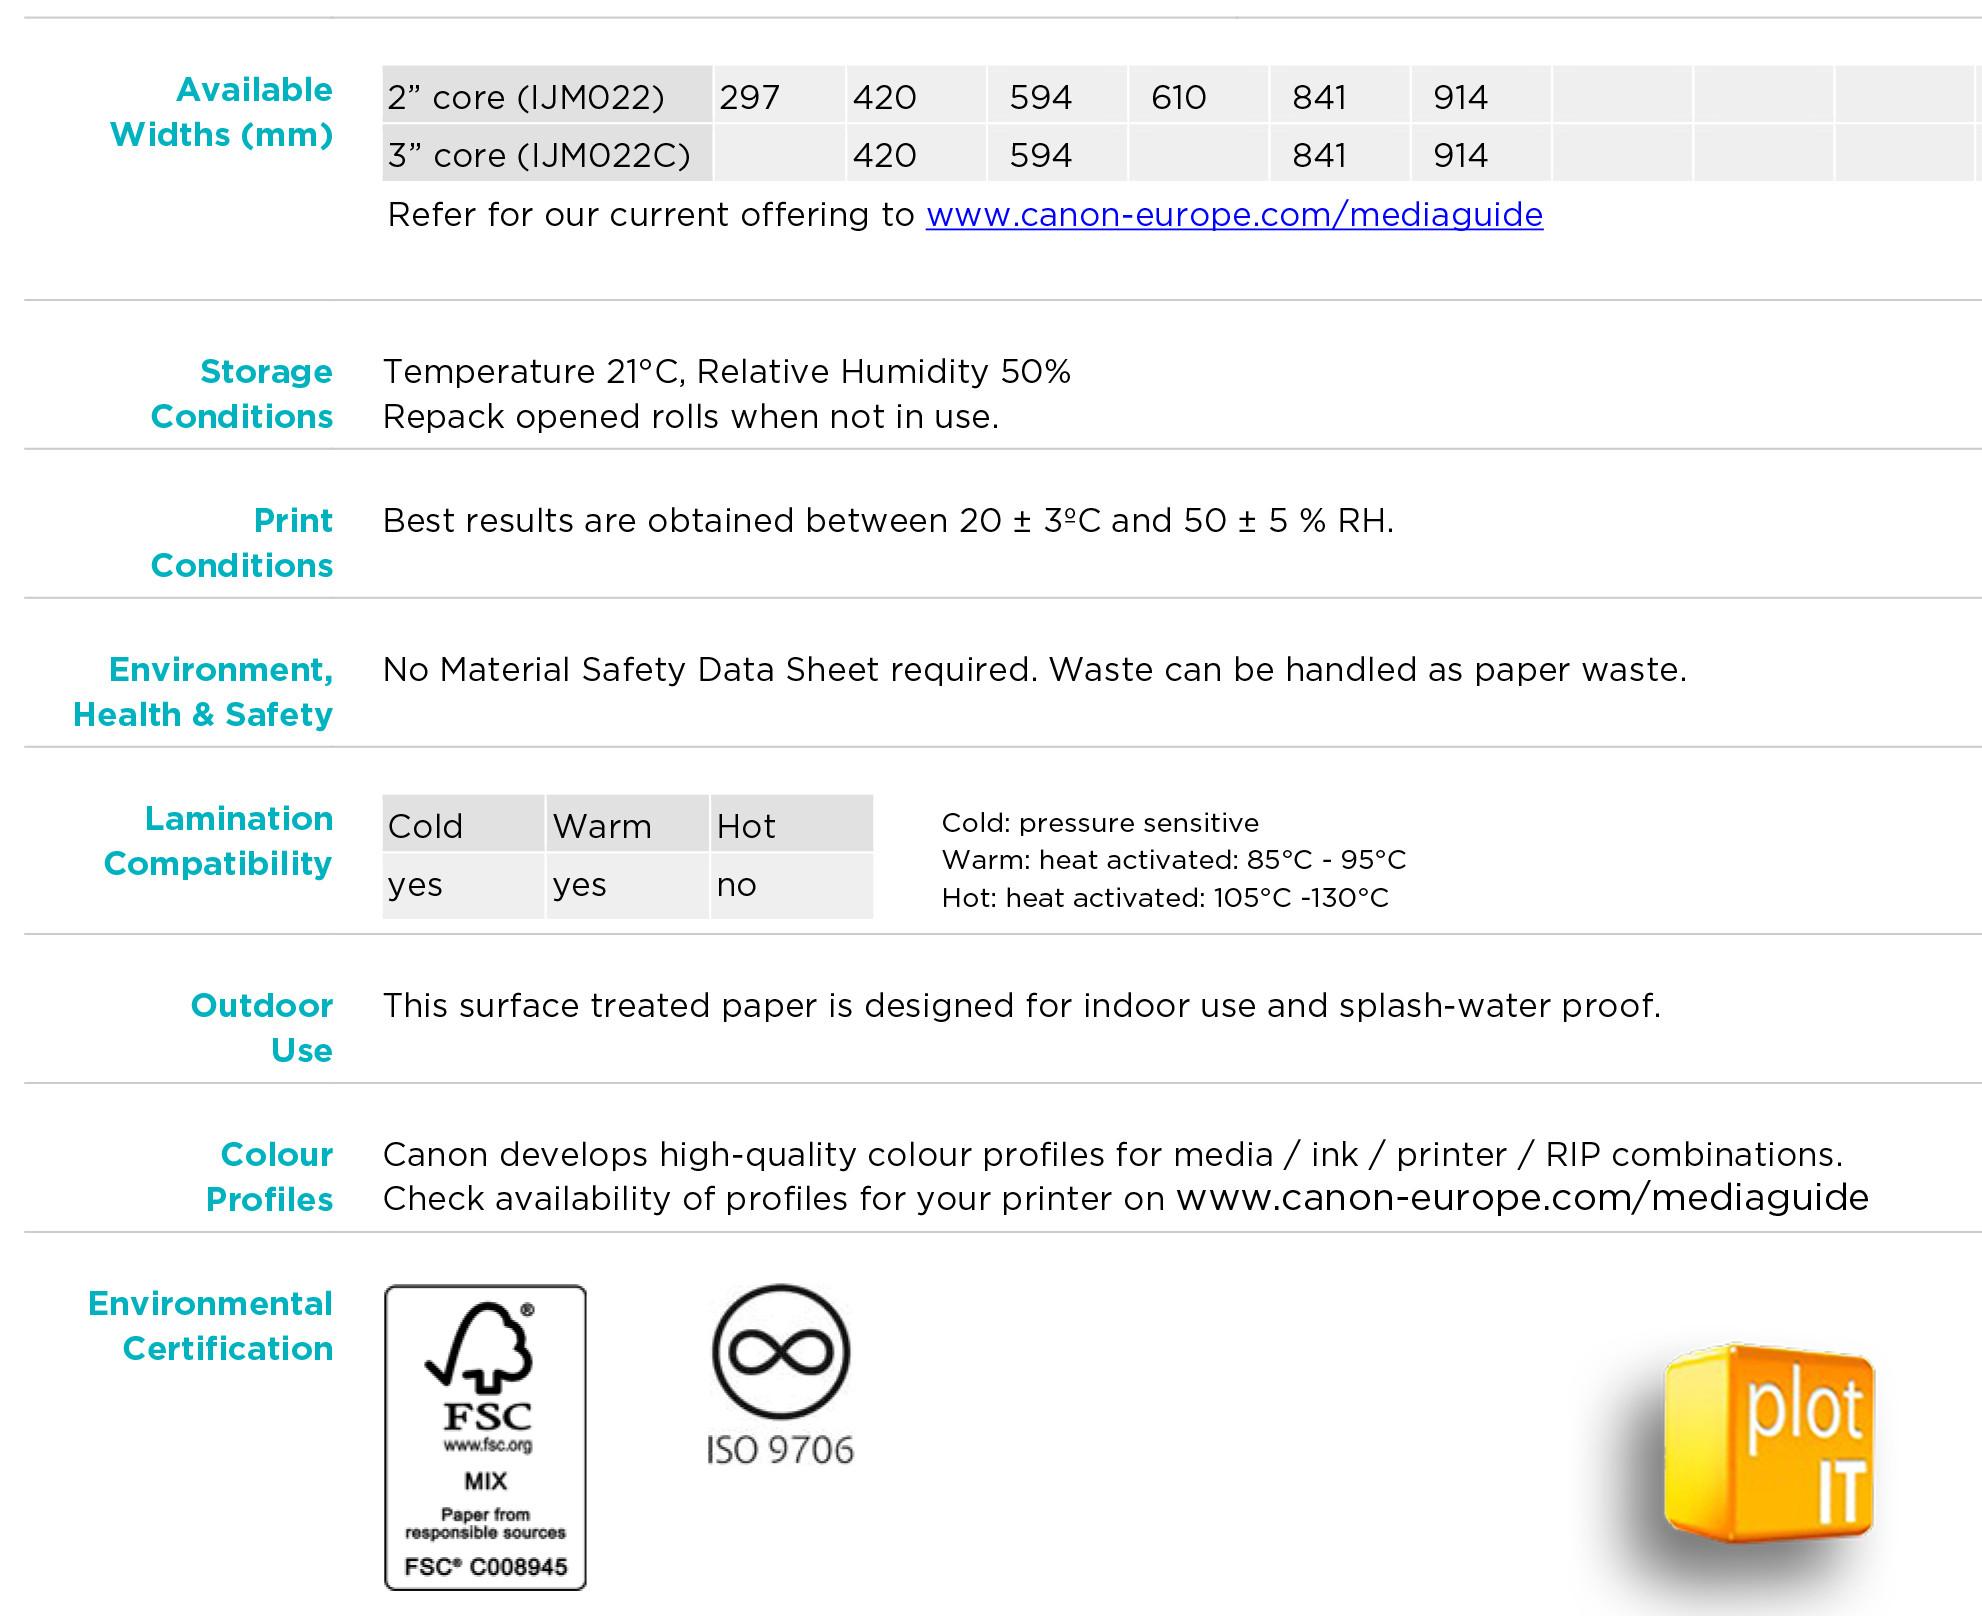 Oce IMJ022 Additional Info